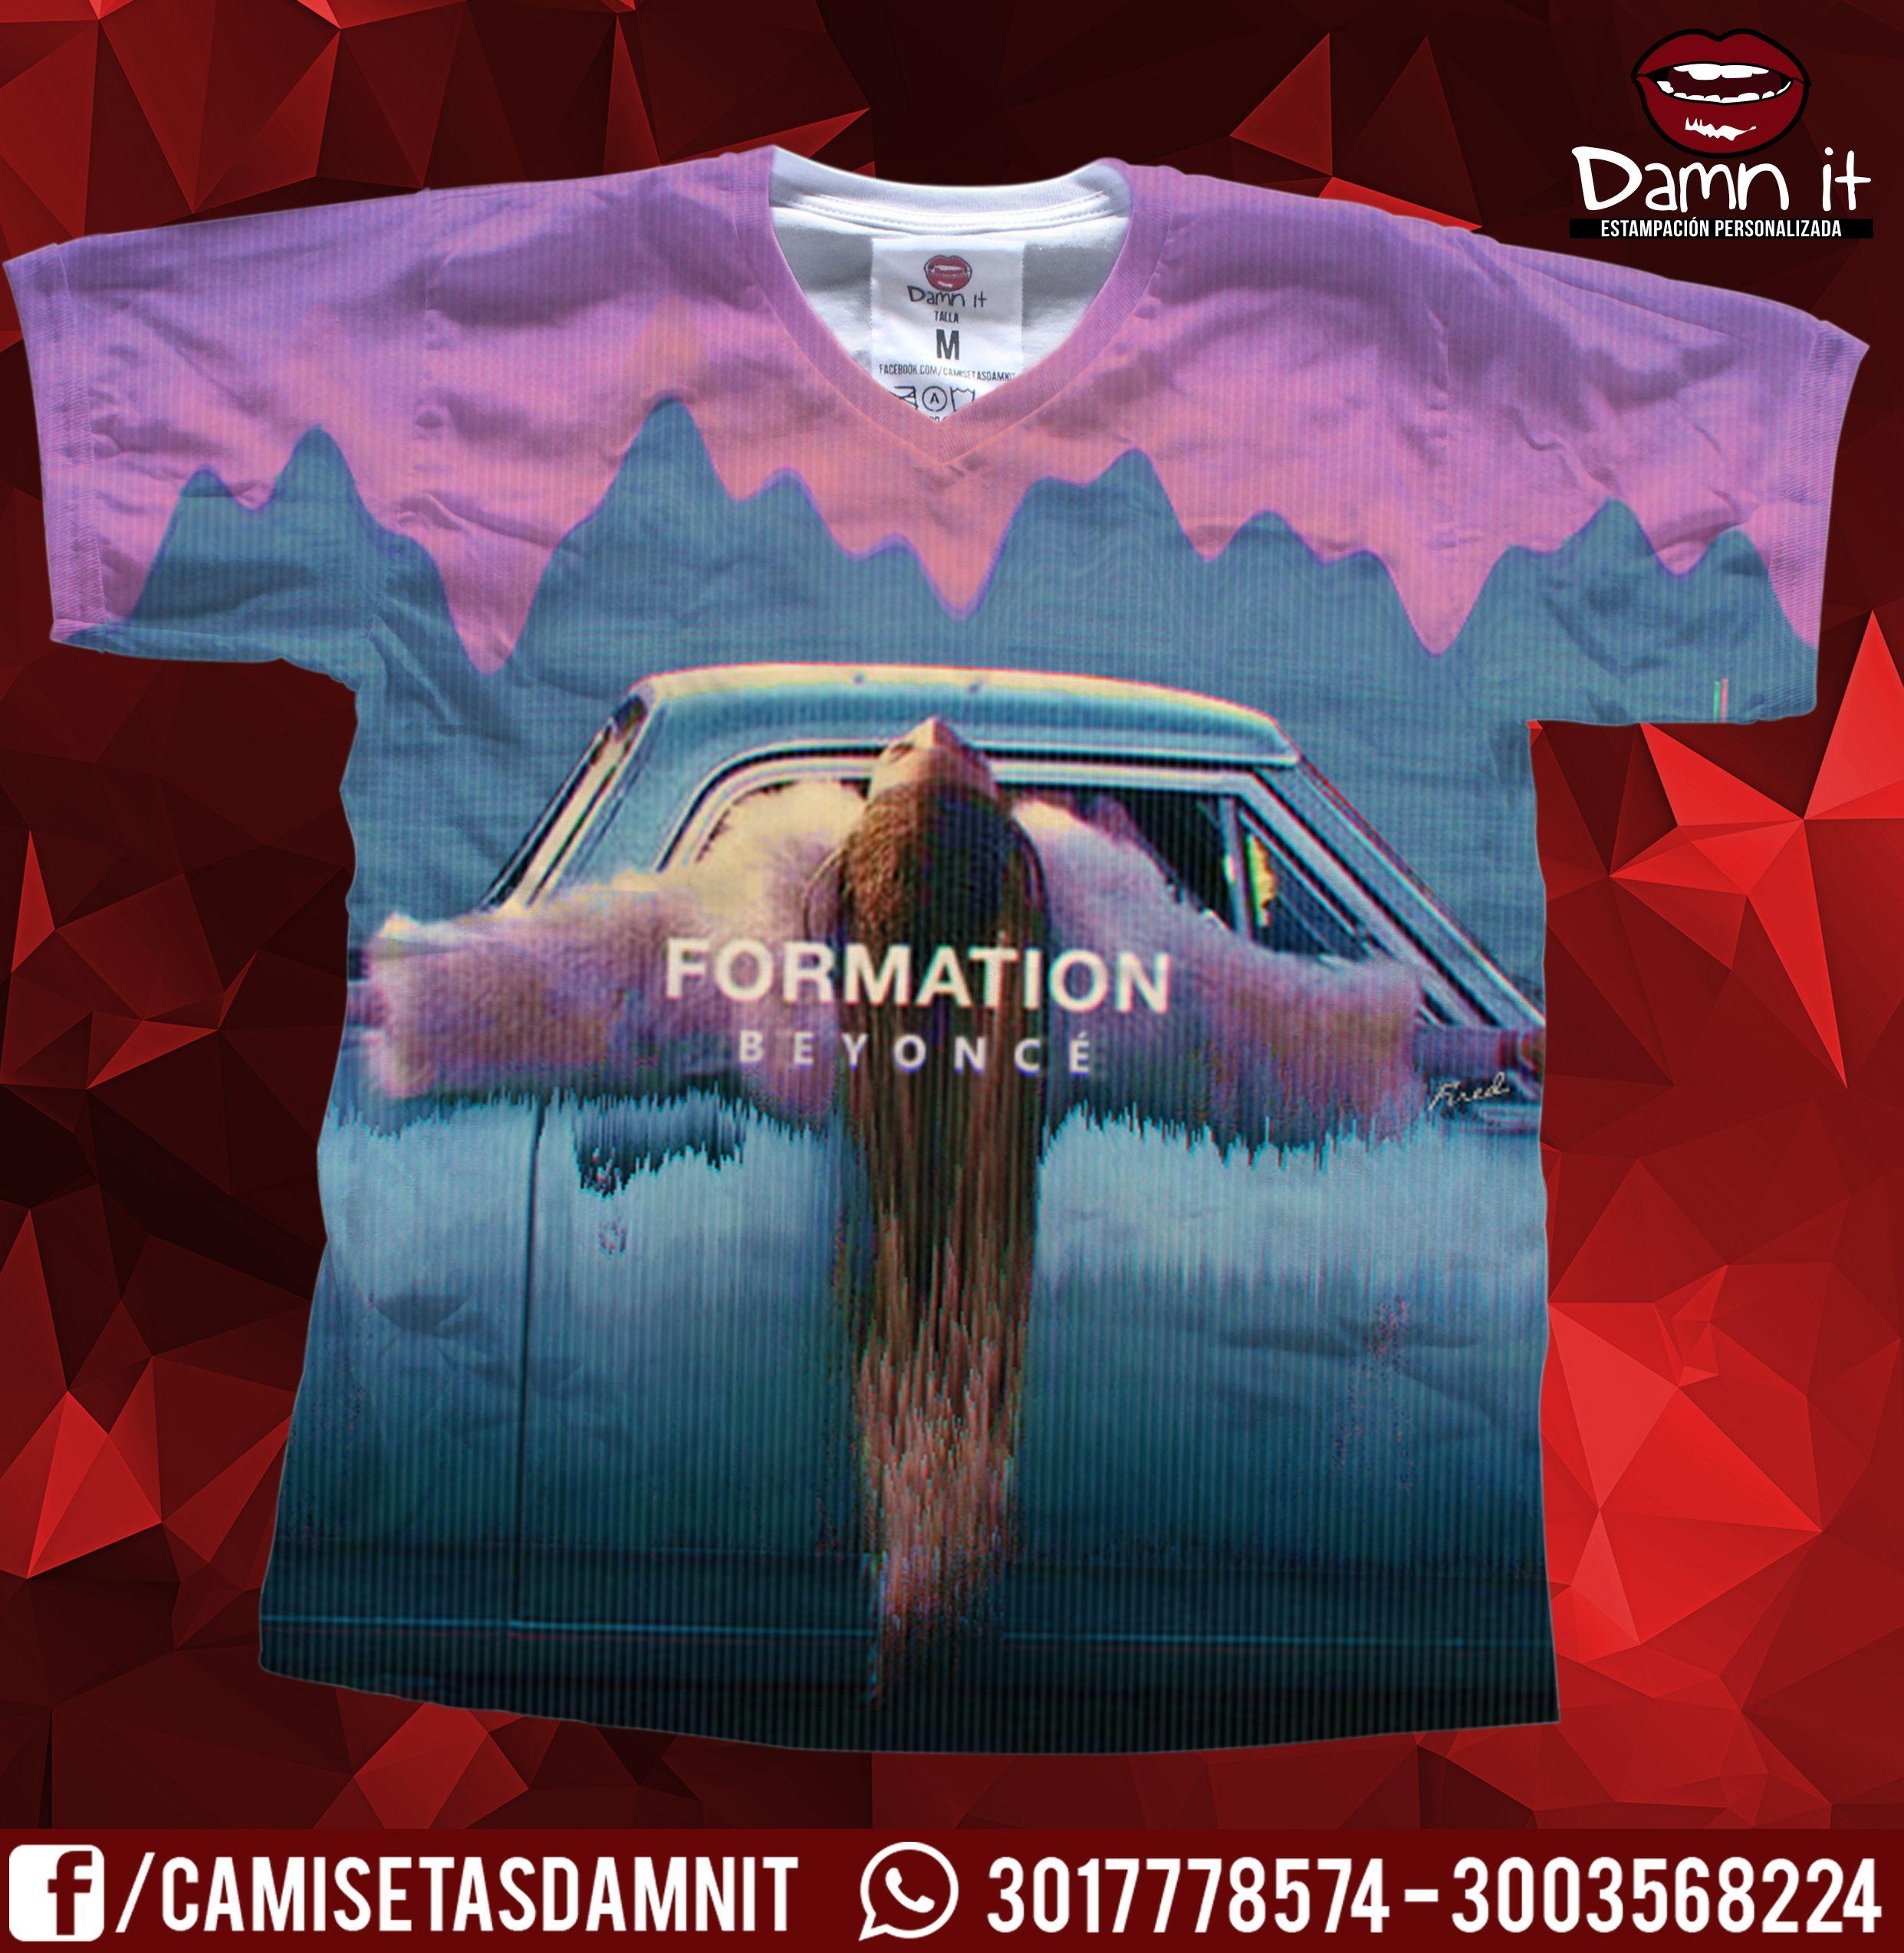 Camiseta FORMATION de Beyoncé  https://www.facebook.com/camisetasdamnit